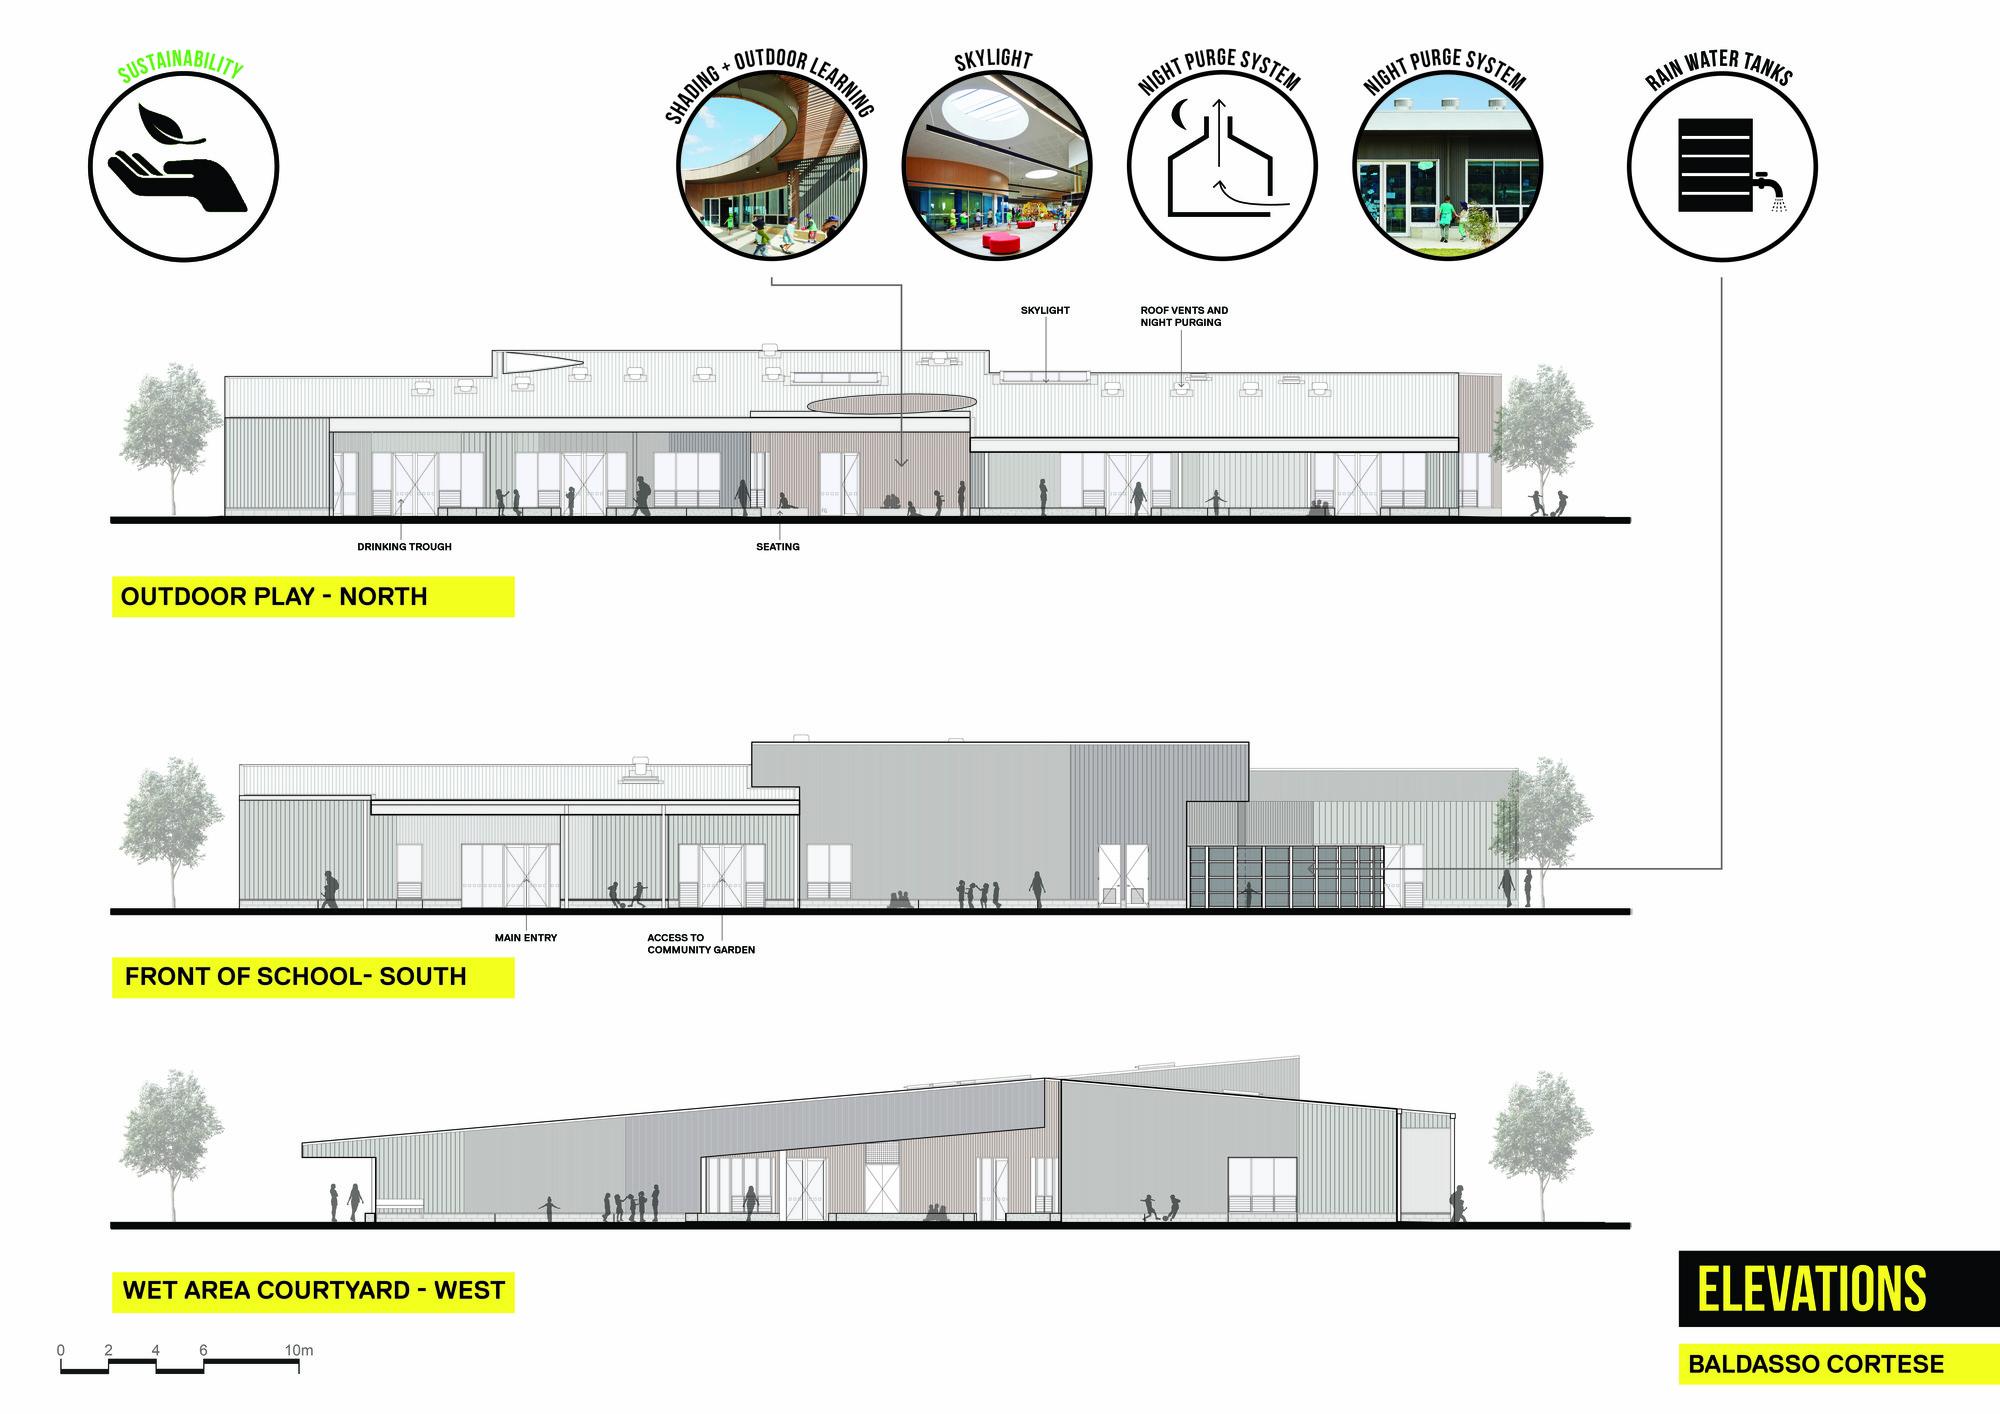 Primary School Plan Elevation : Gallery of st mary the cross primary school baldasso